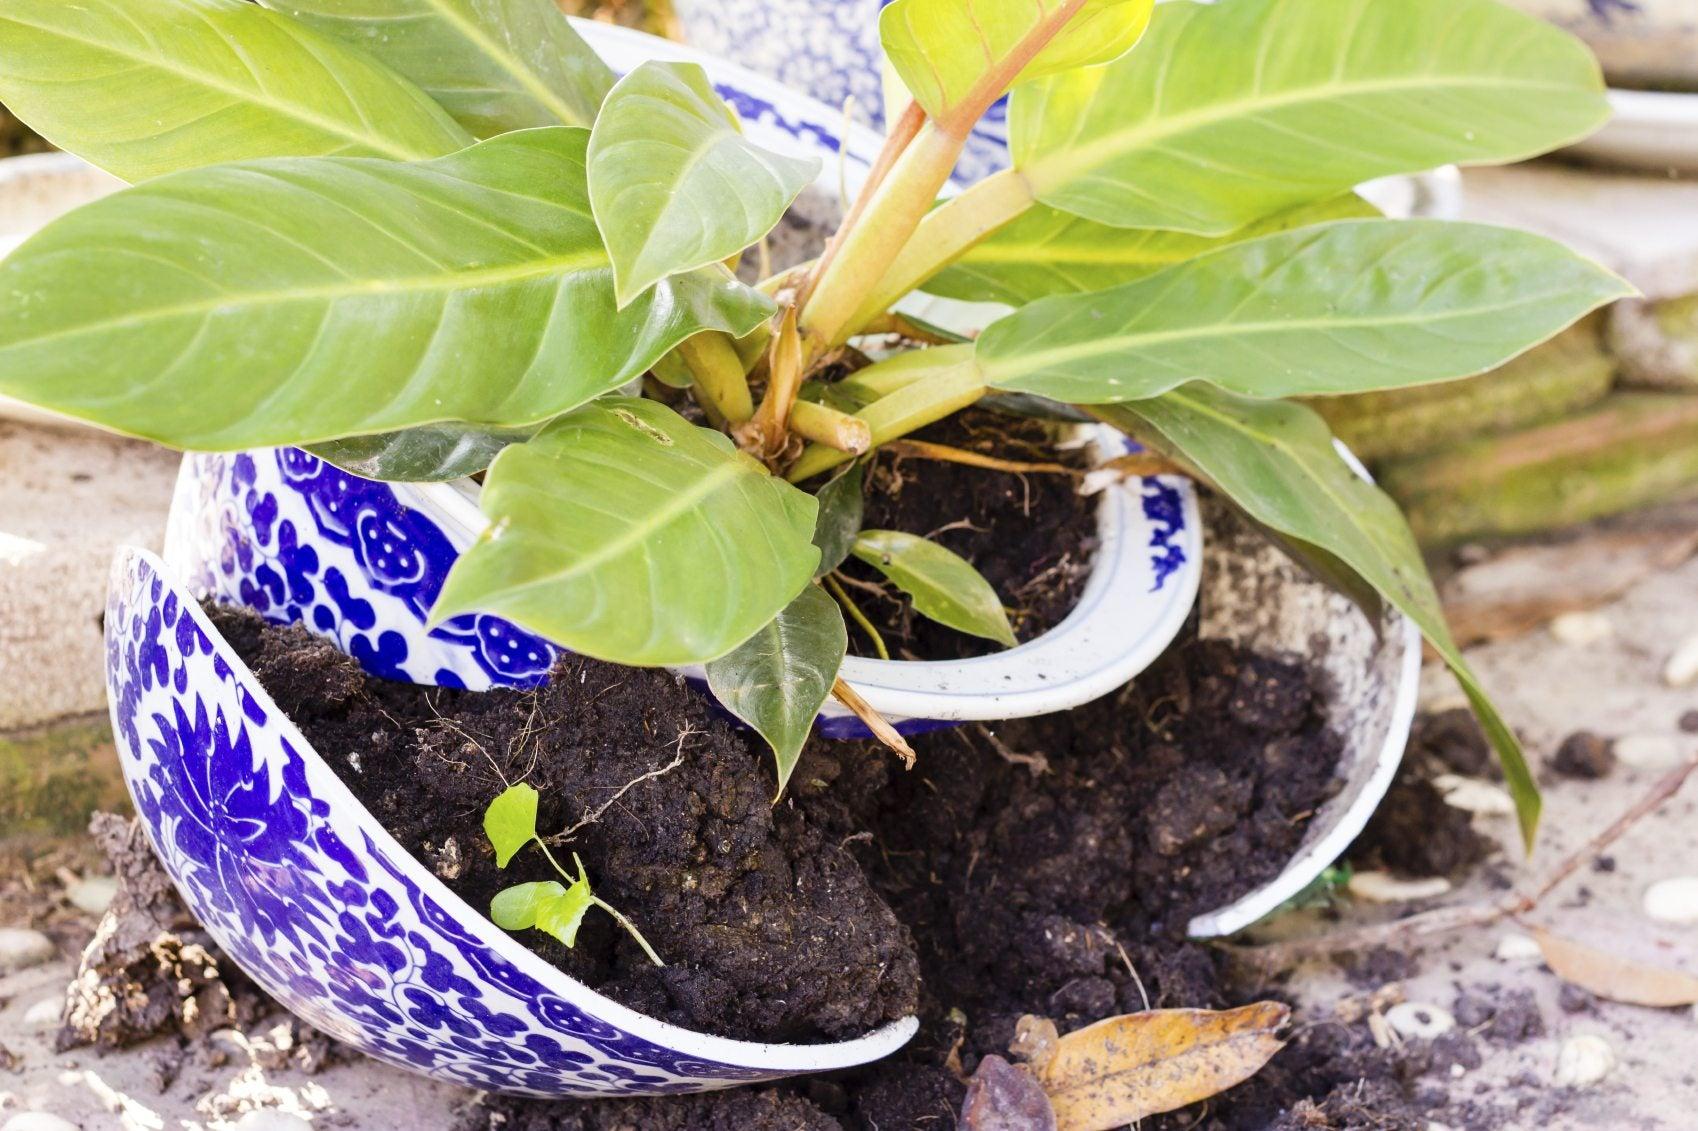 Broken Pot Garden Ideas: How To Make A Garden From Broken Pots